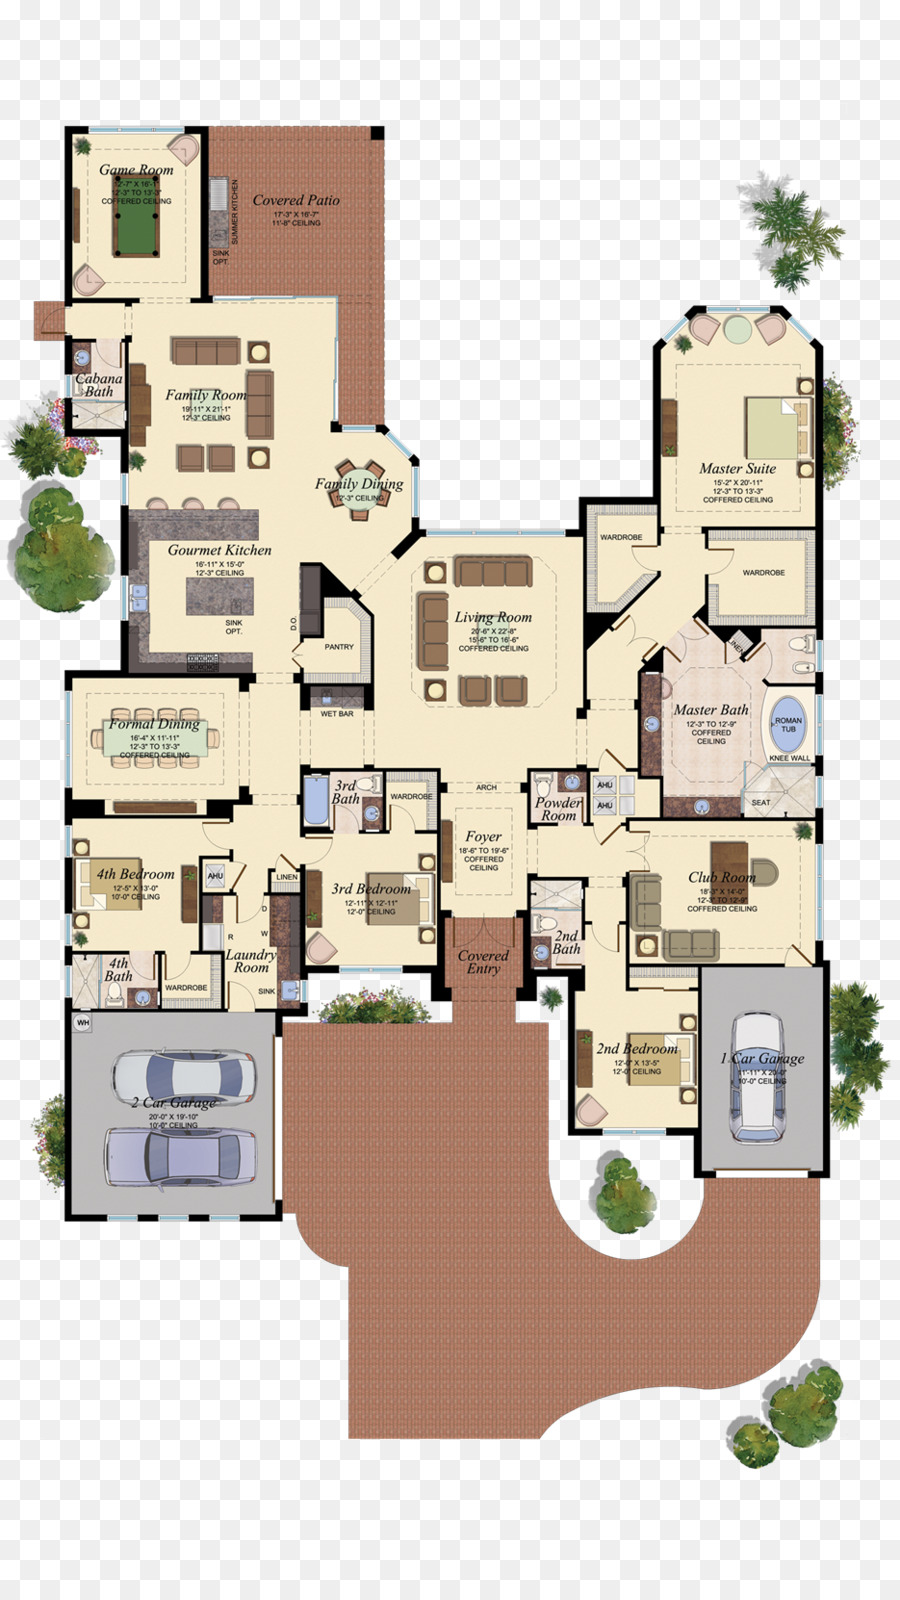 Creation Sims 4 Maison Sur Plan Speed Build Youtube 4